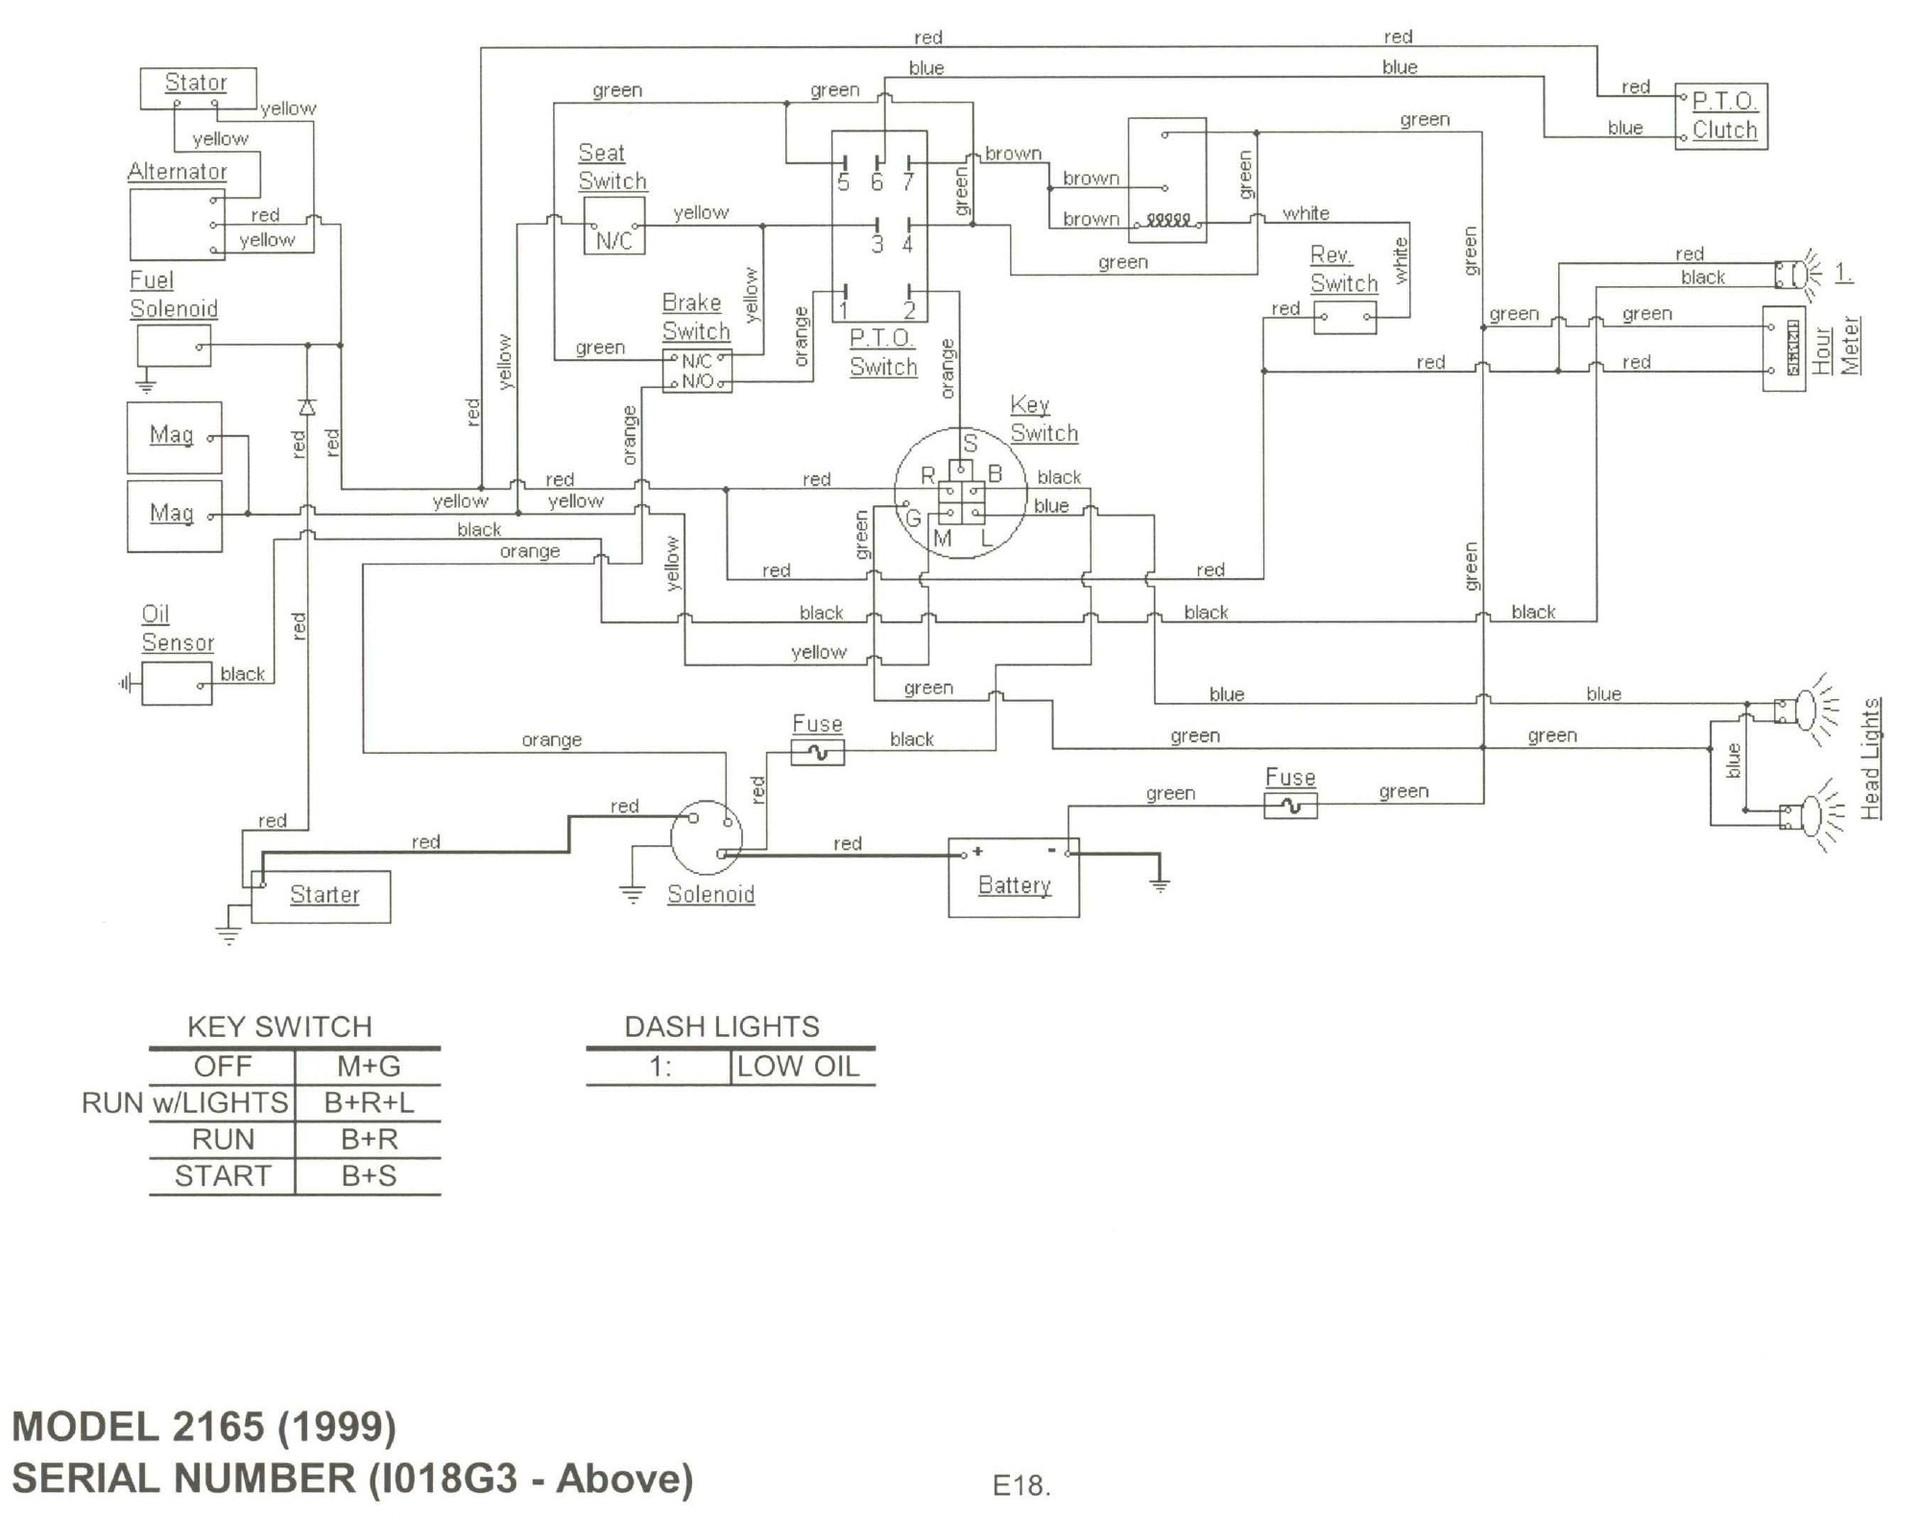 2135 cub cadet wiring diagram cub cadet 2165 wiring diagram e1 wiring diagram  cub cadet 2165 wiring diagram e1